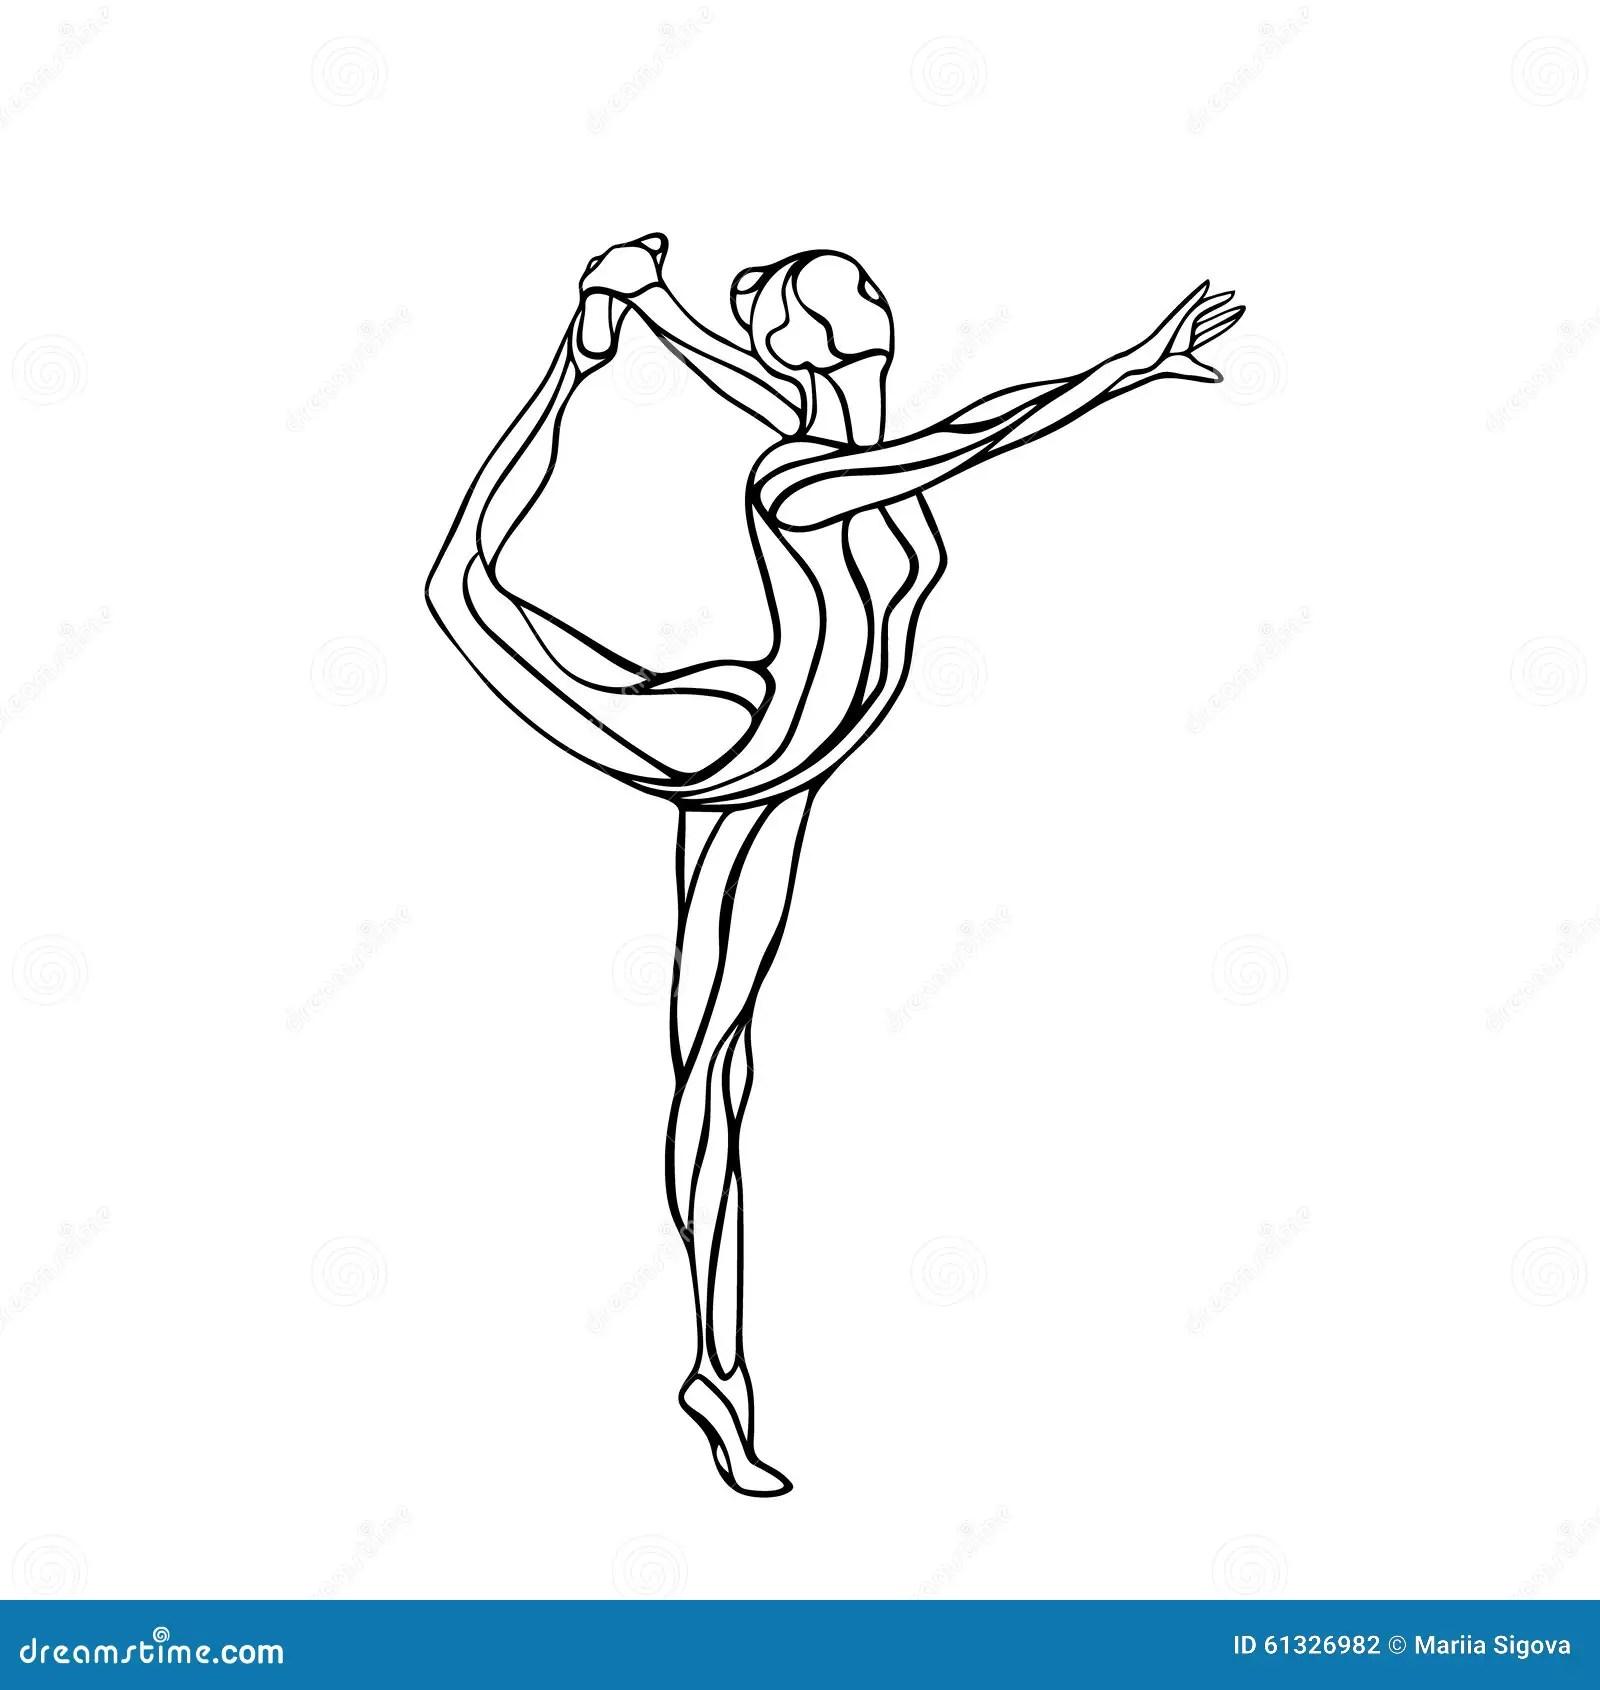 Silhouette Of Gymnastic Girl Art Gymnastics Stock Vector